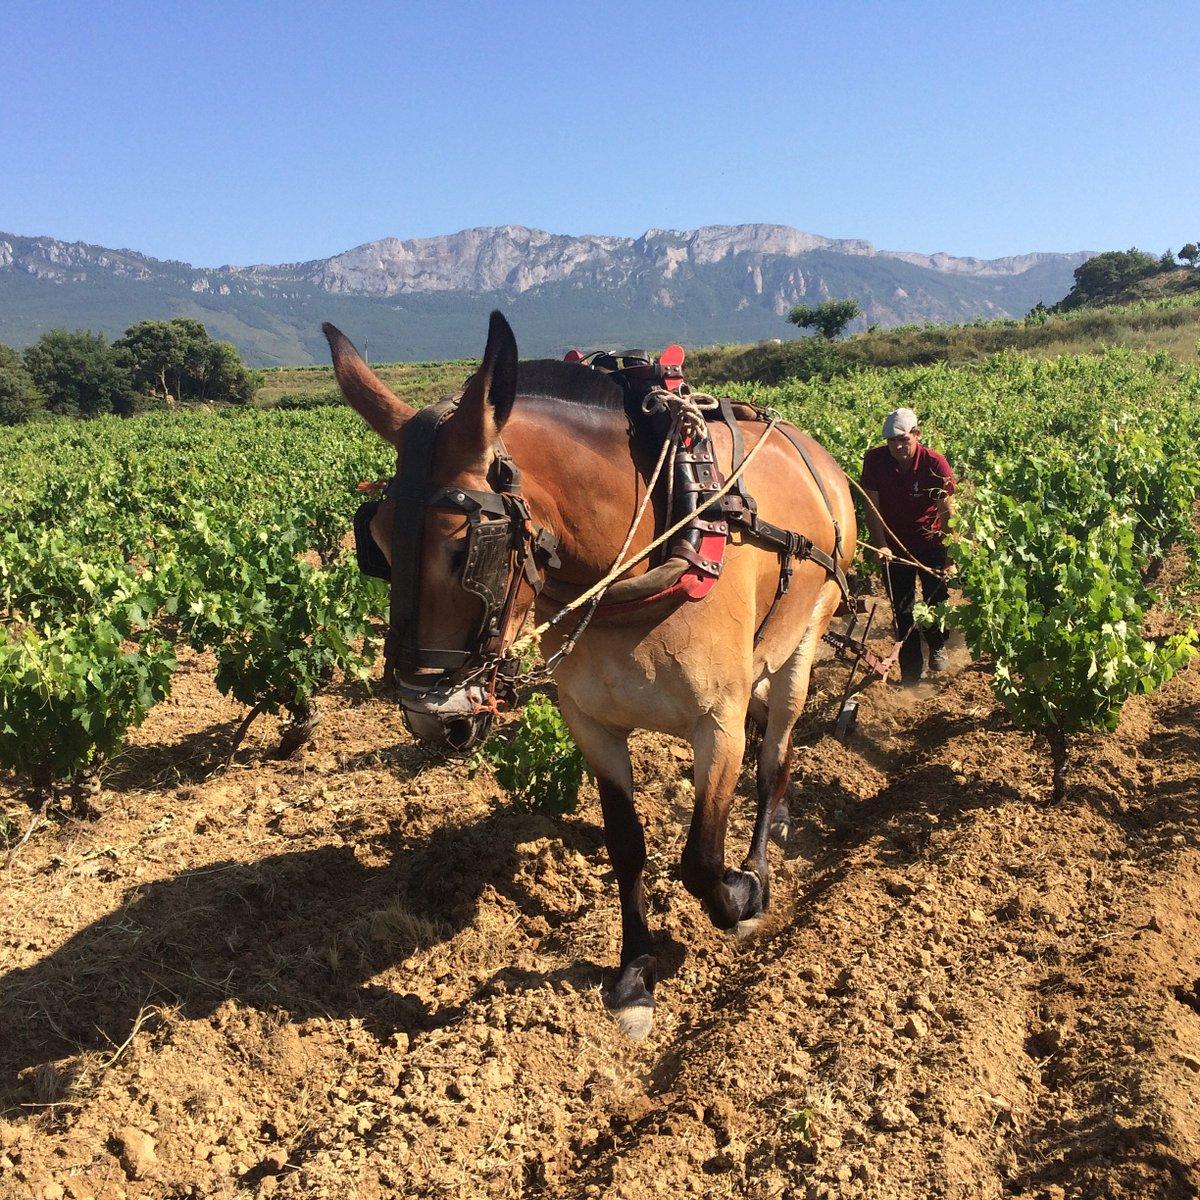 BLOG POST: A visit to beautiful Basque Rioja, post-Brexit #wine #RiojaAlavesa https://t.co/n3piiMC4Fe https://t.co/qro4yI60e4